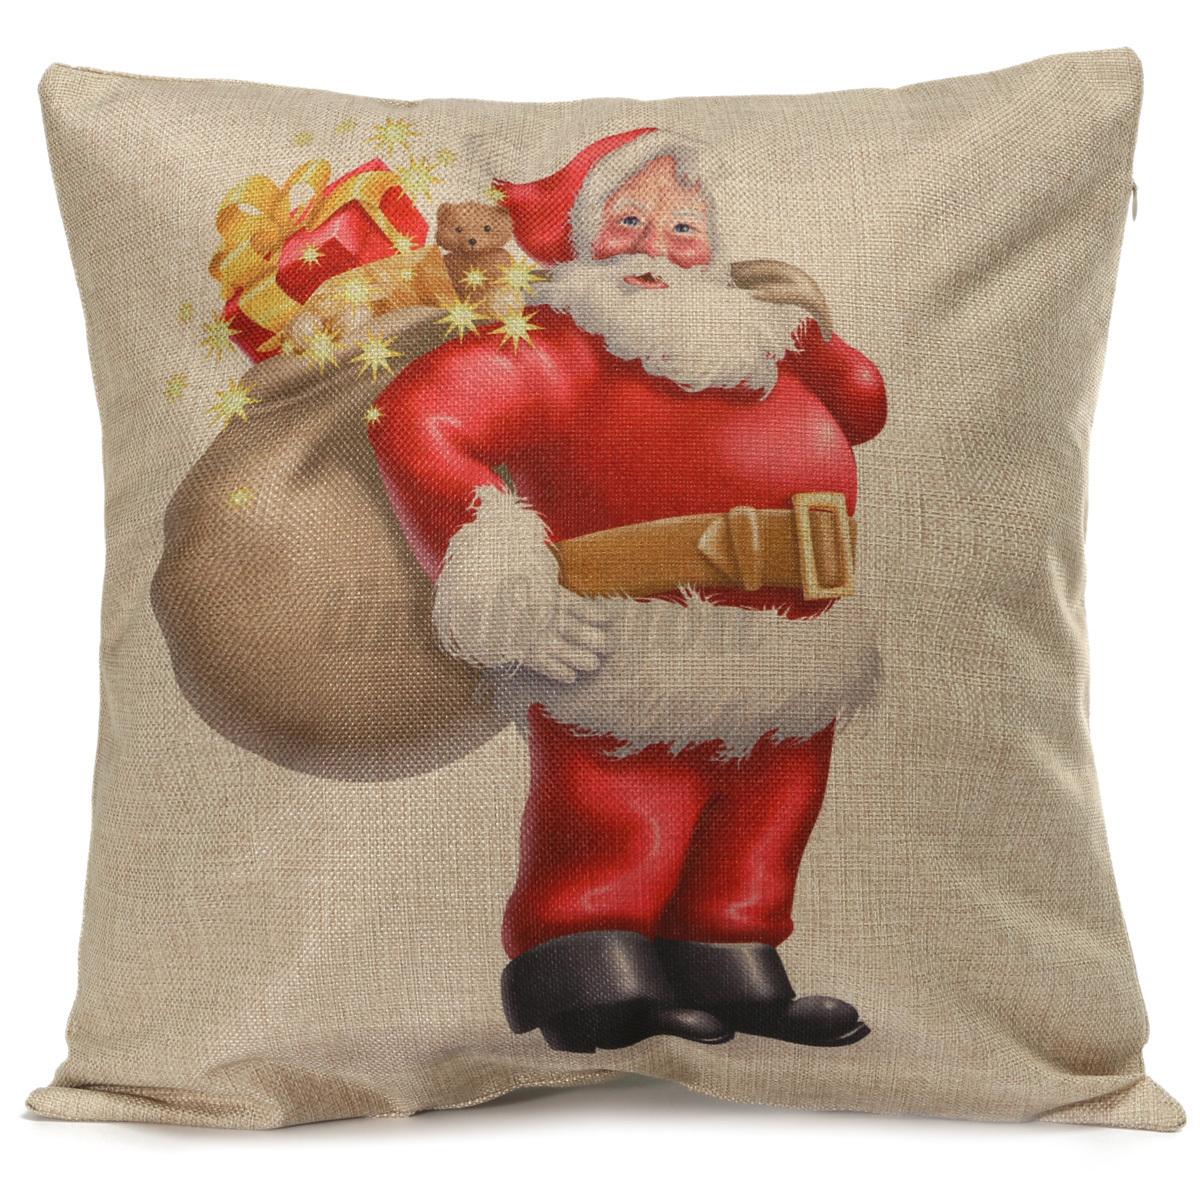 XMAS Christmas Cushion Cover Ambience Decorative Square Pillow Case Car Decor eBay